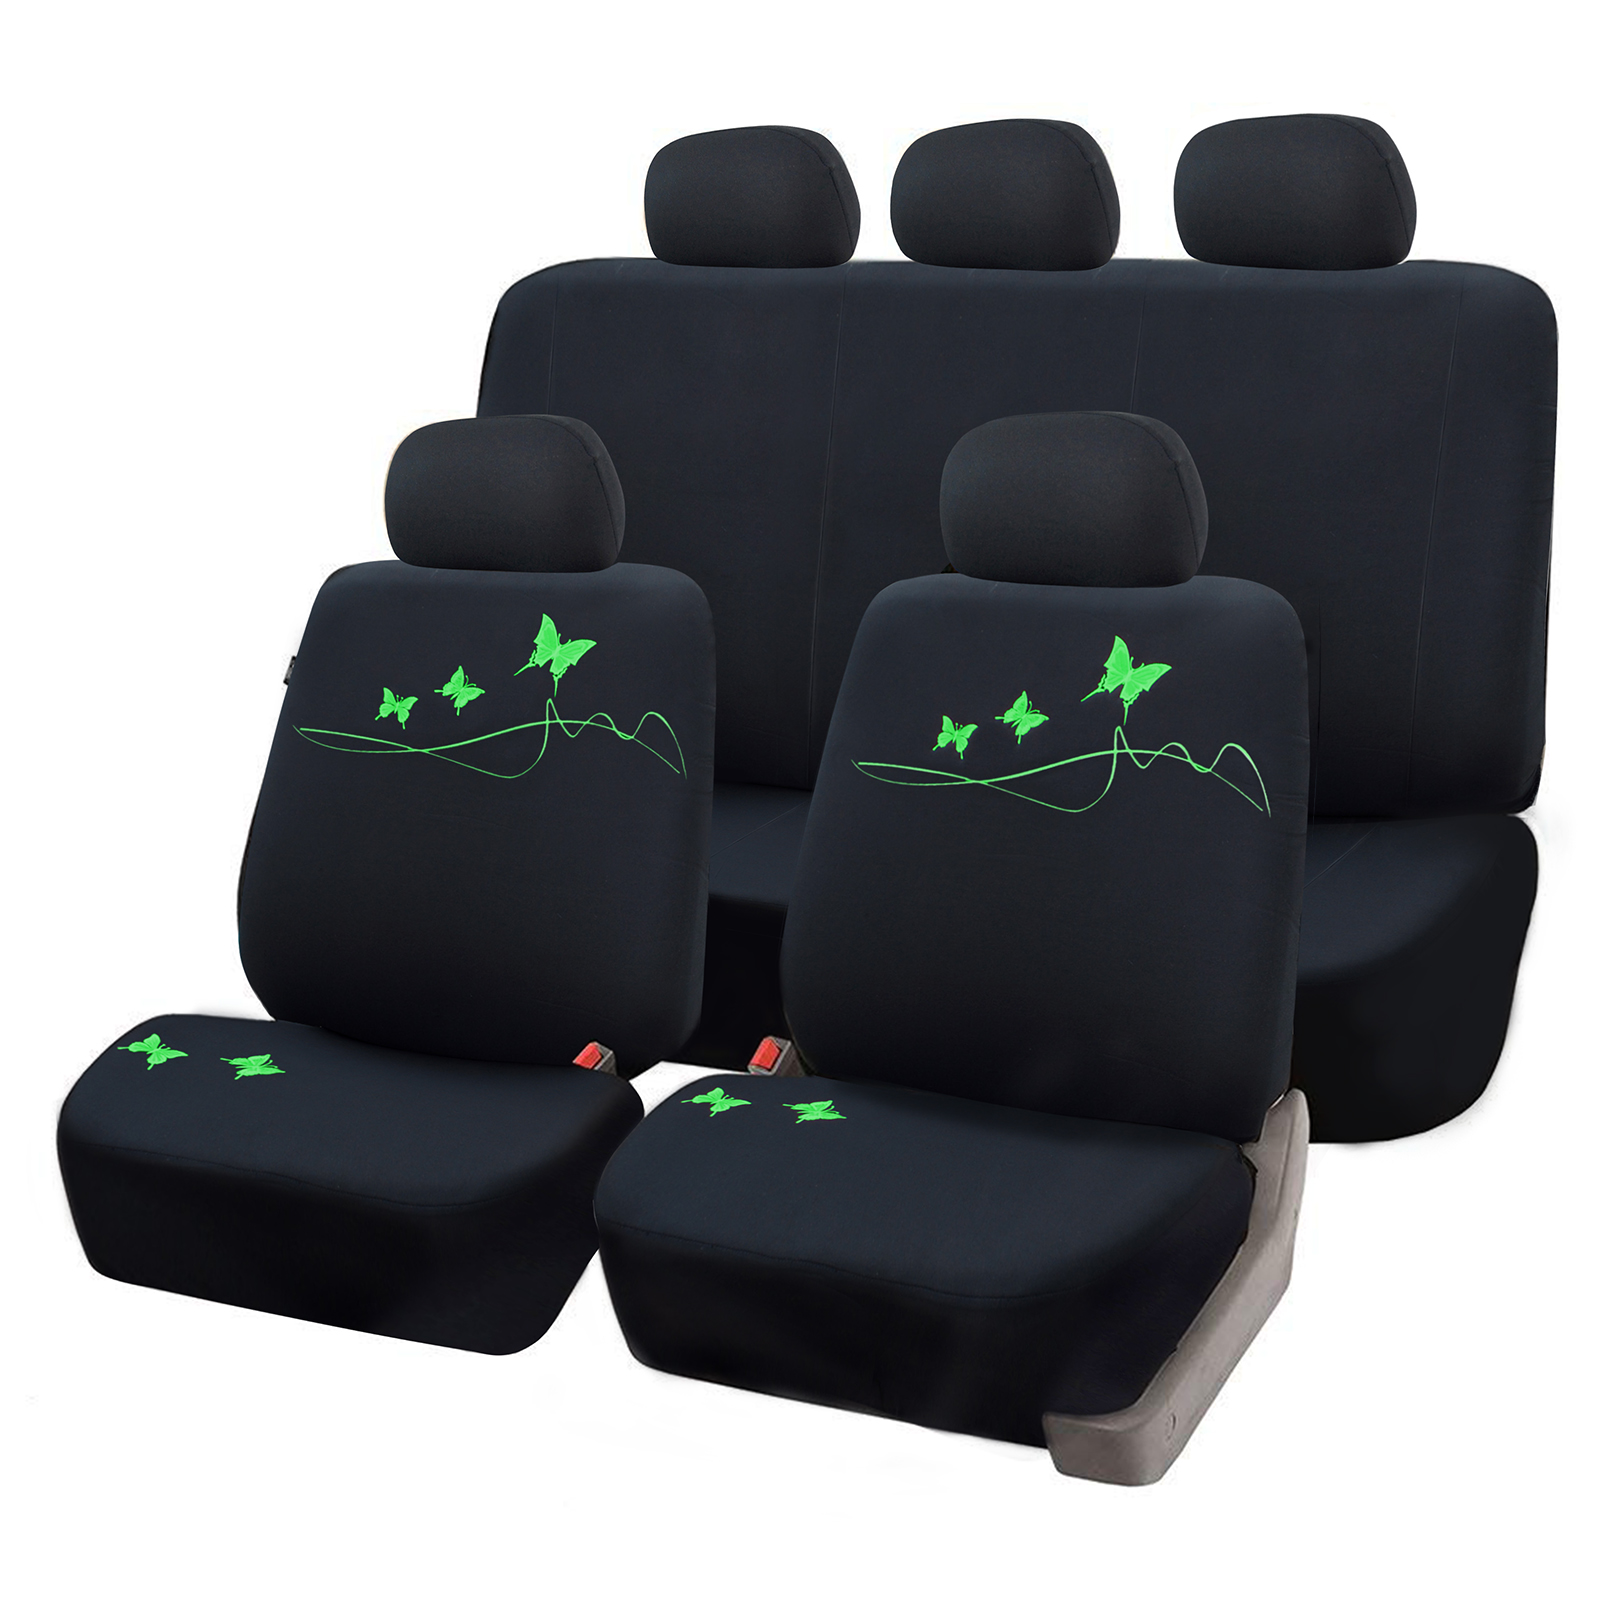 auto schonbezug komplettset sitzbez ge f r skoda yeti scsc009822 ebay. Black Bedroom Furniture Sets. Home Design Ideas